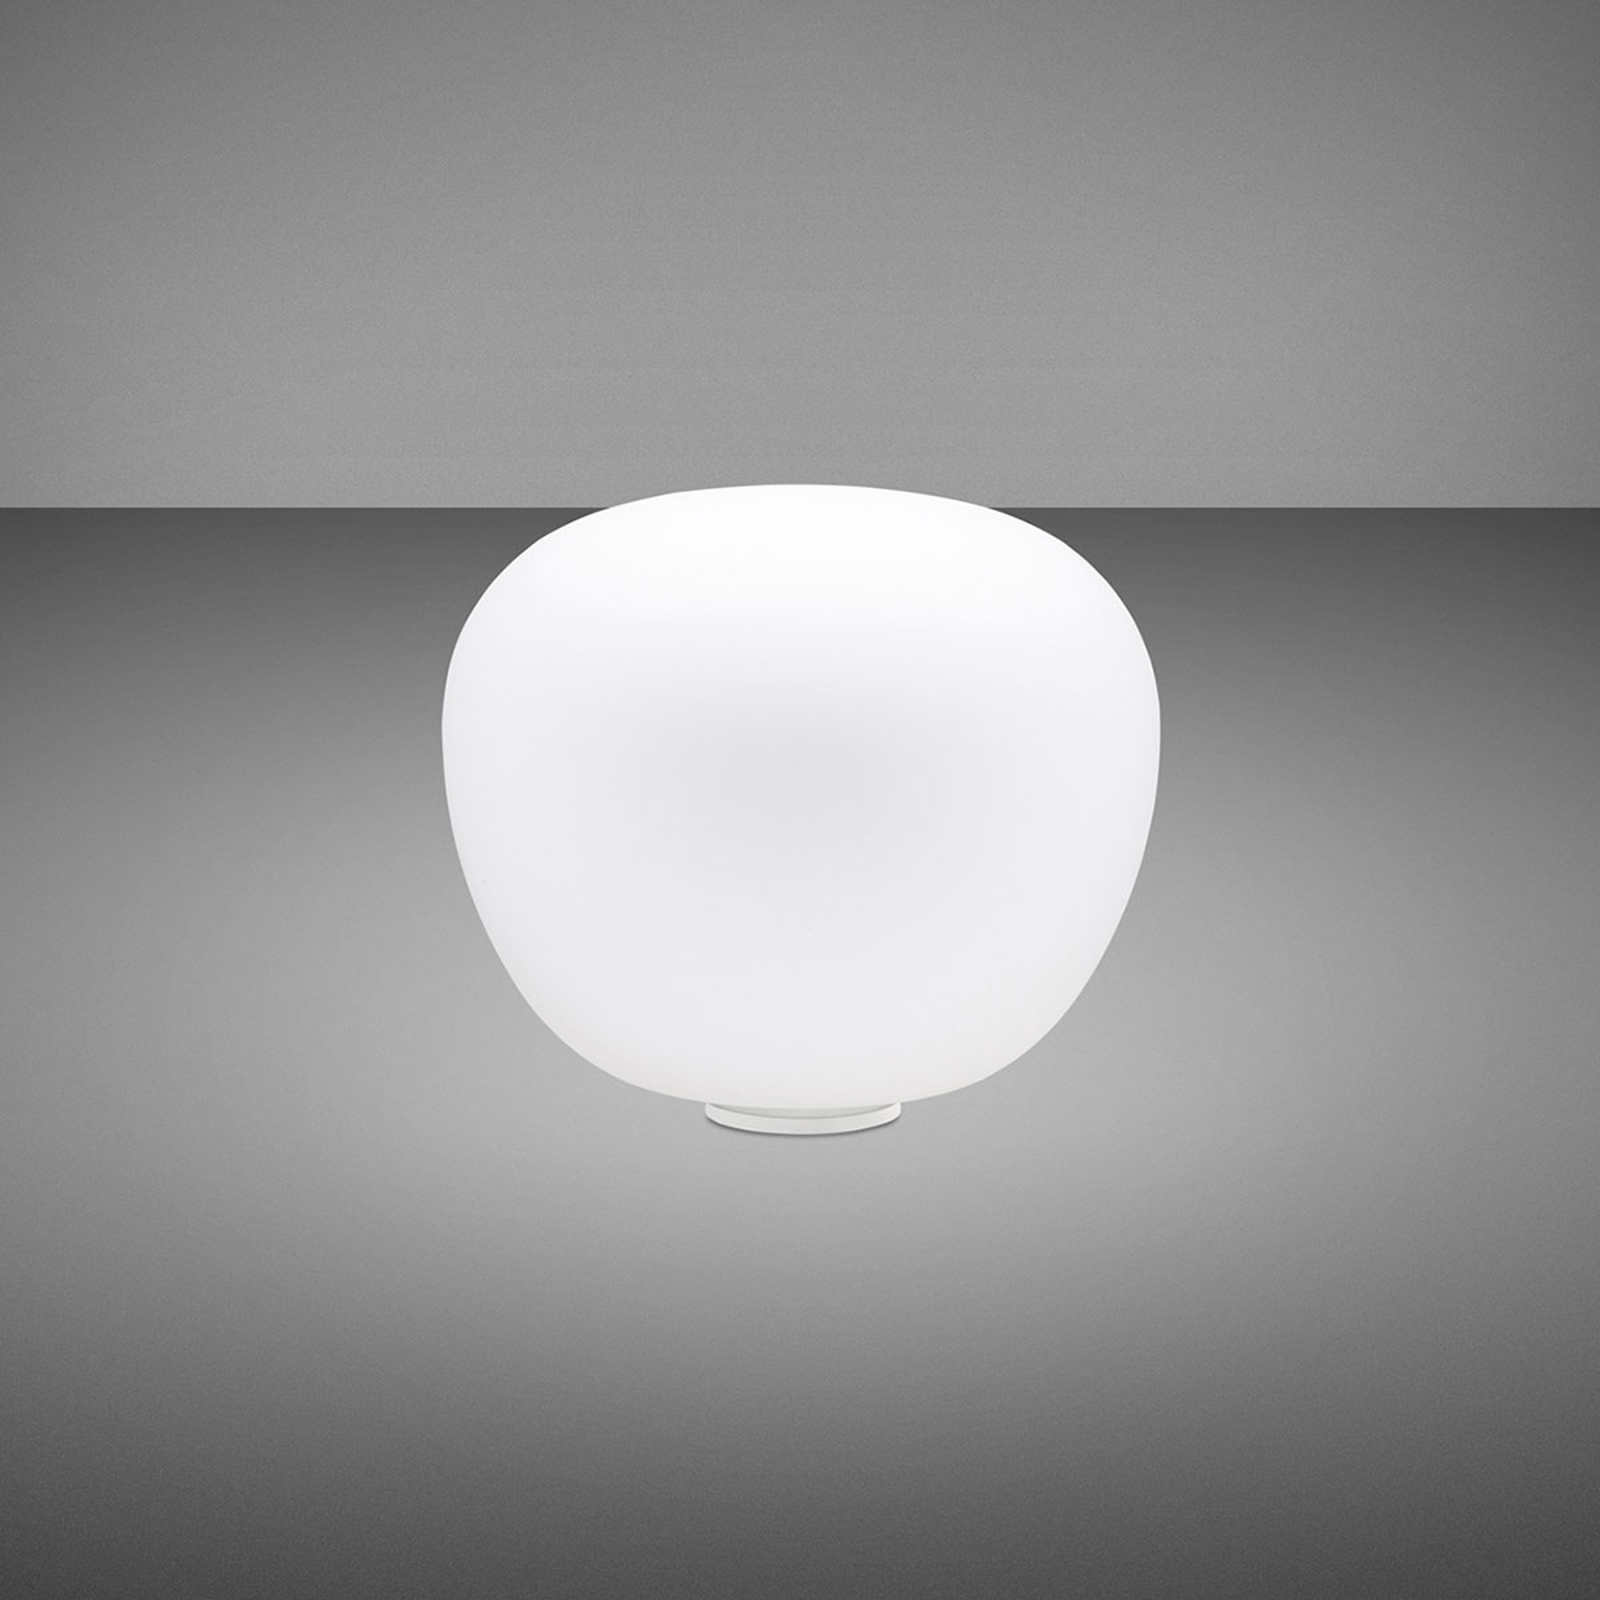 Fabbian Lumi Mochi lampe à poser, couchée, Ø 20cm